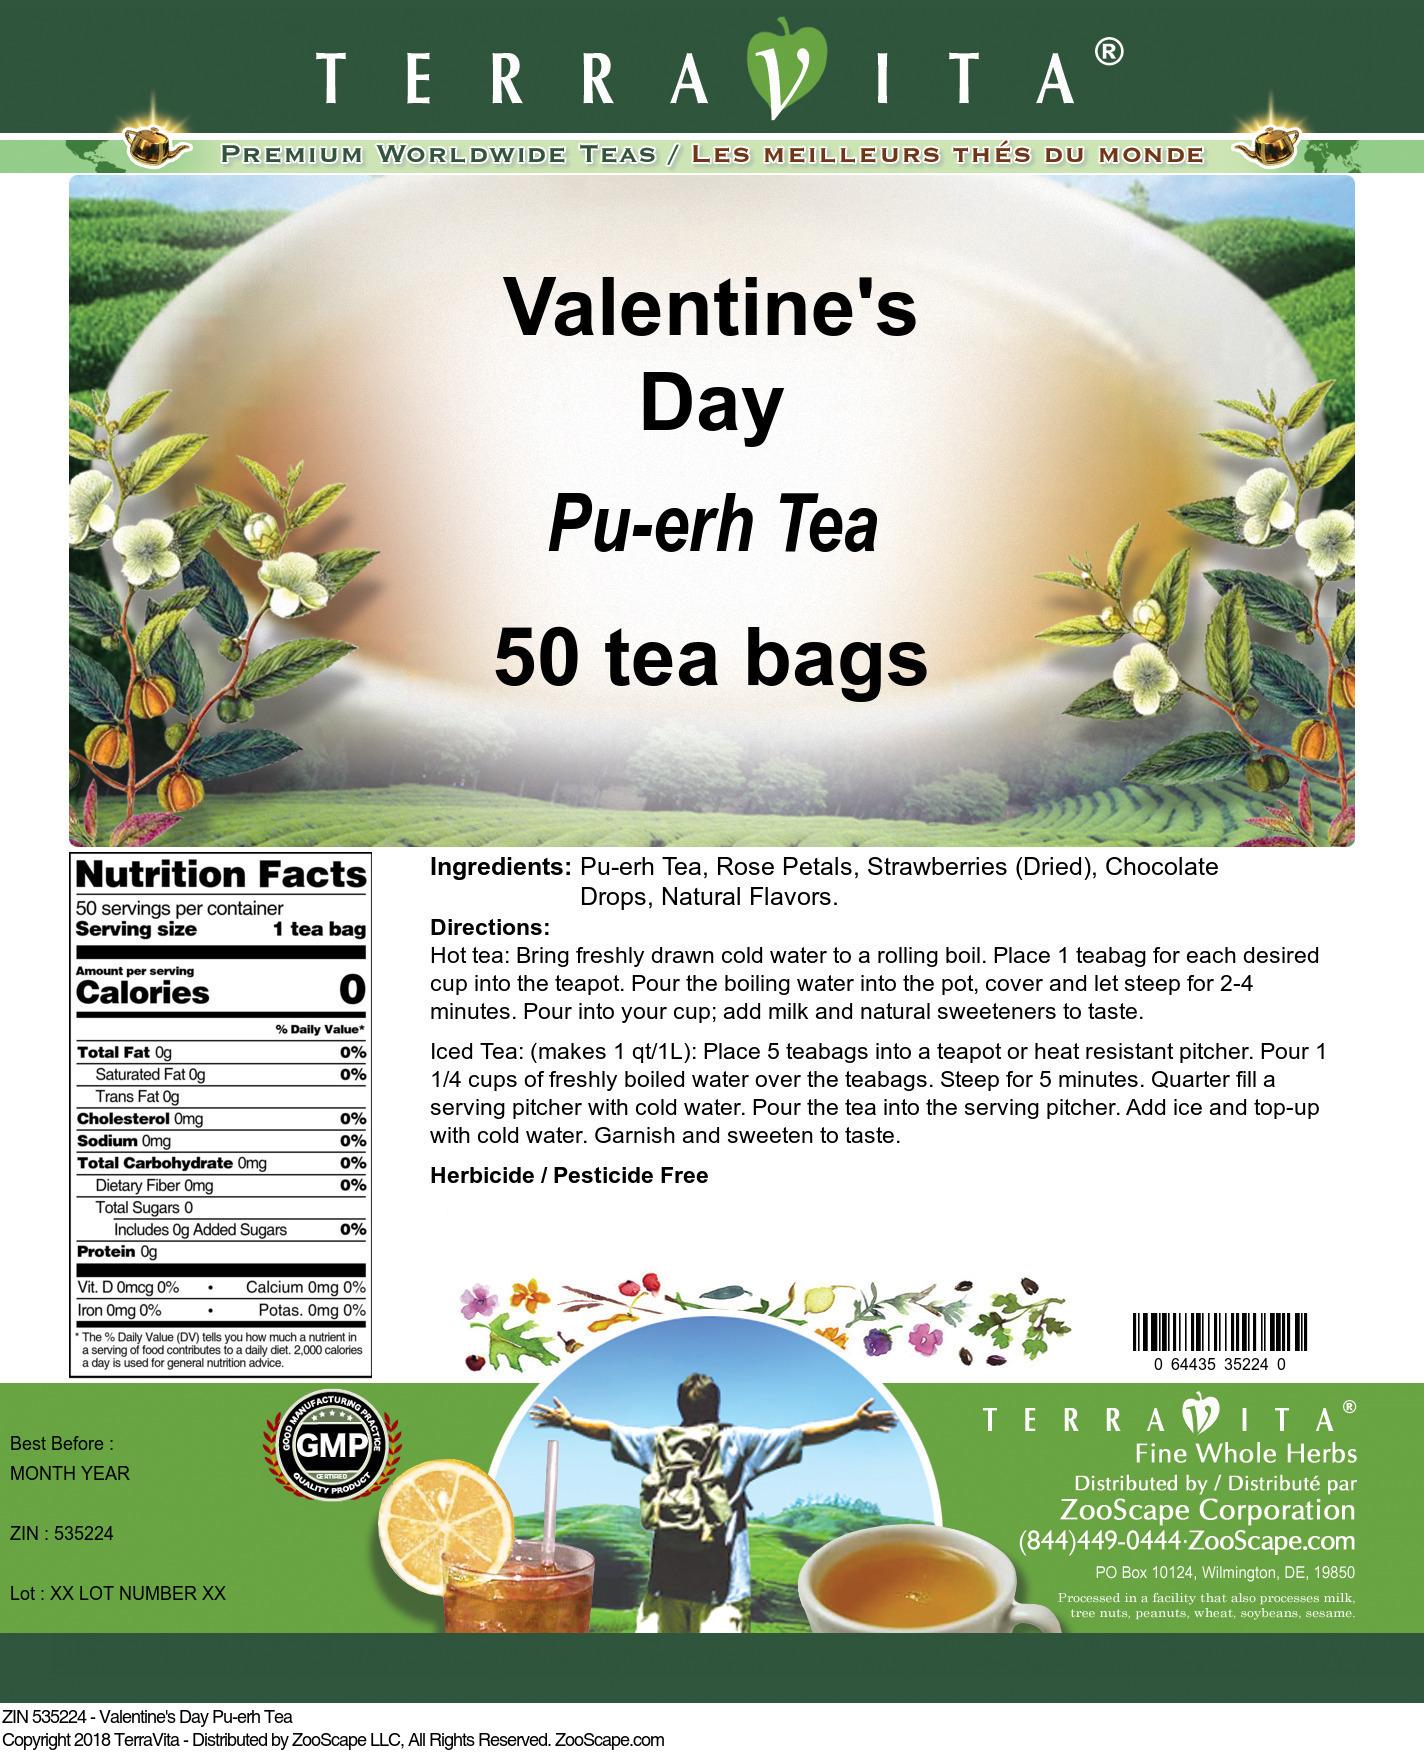 Valentine's Day Pu-erh Tea